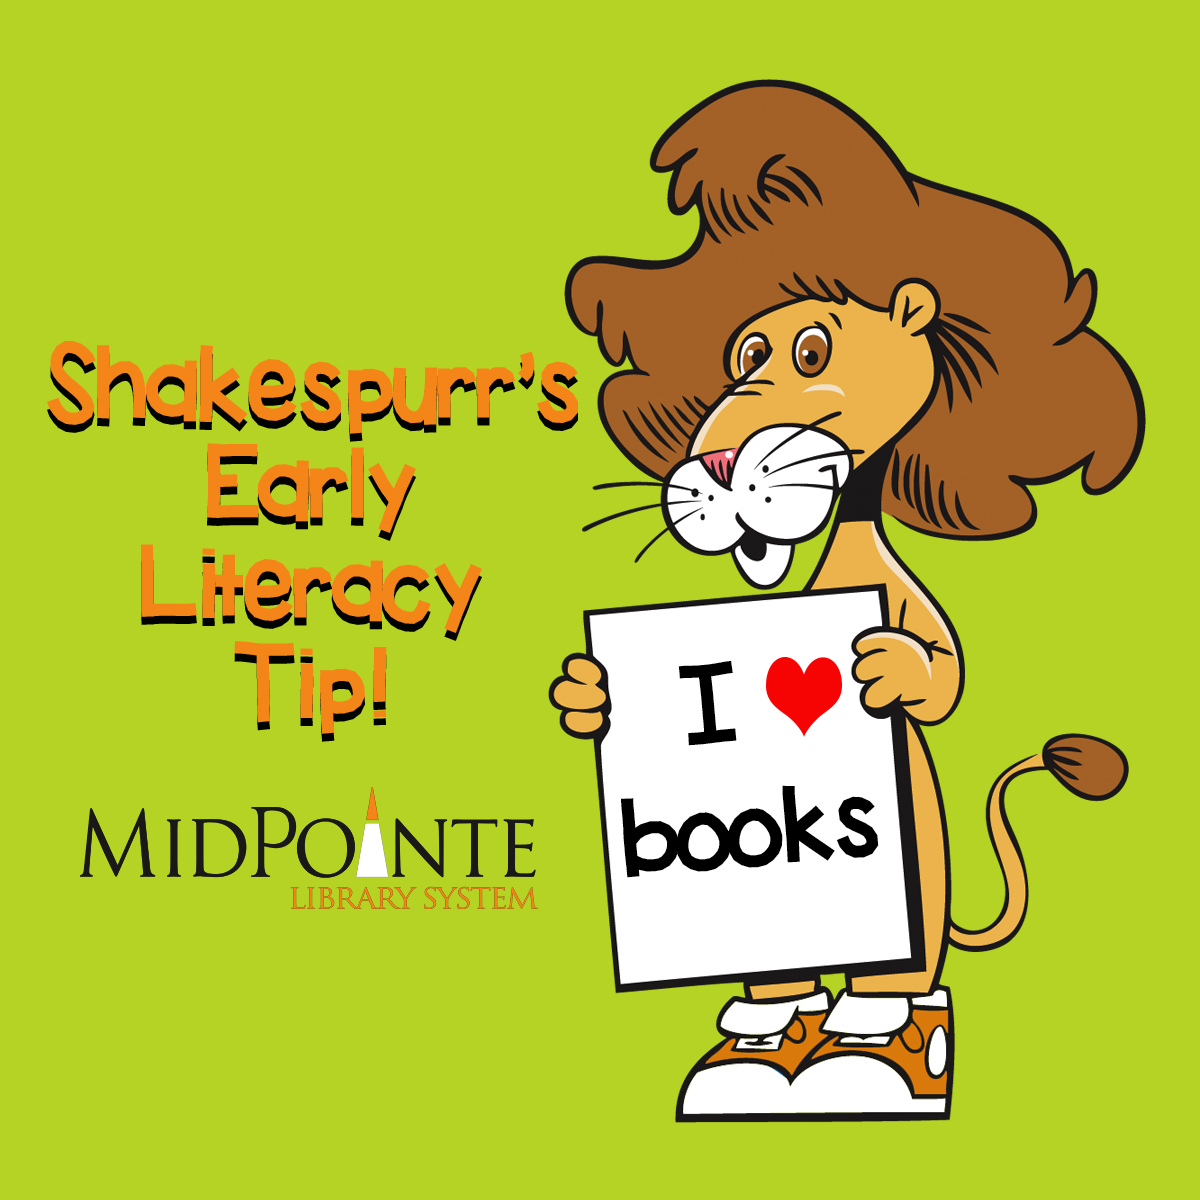 literacy tip facebook graphic revised.jpg